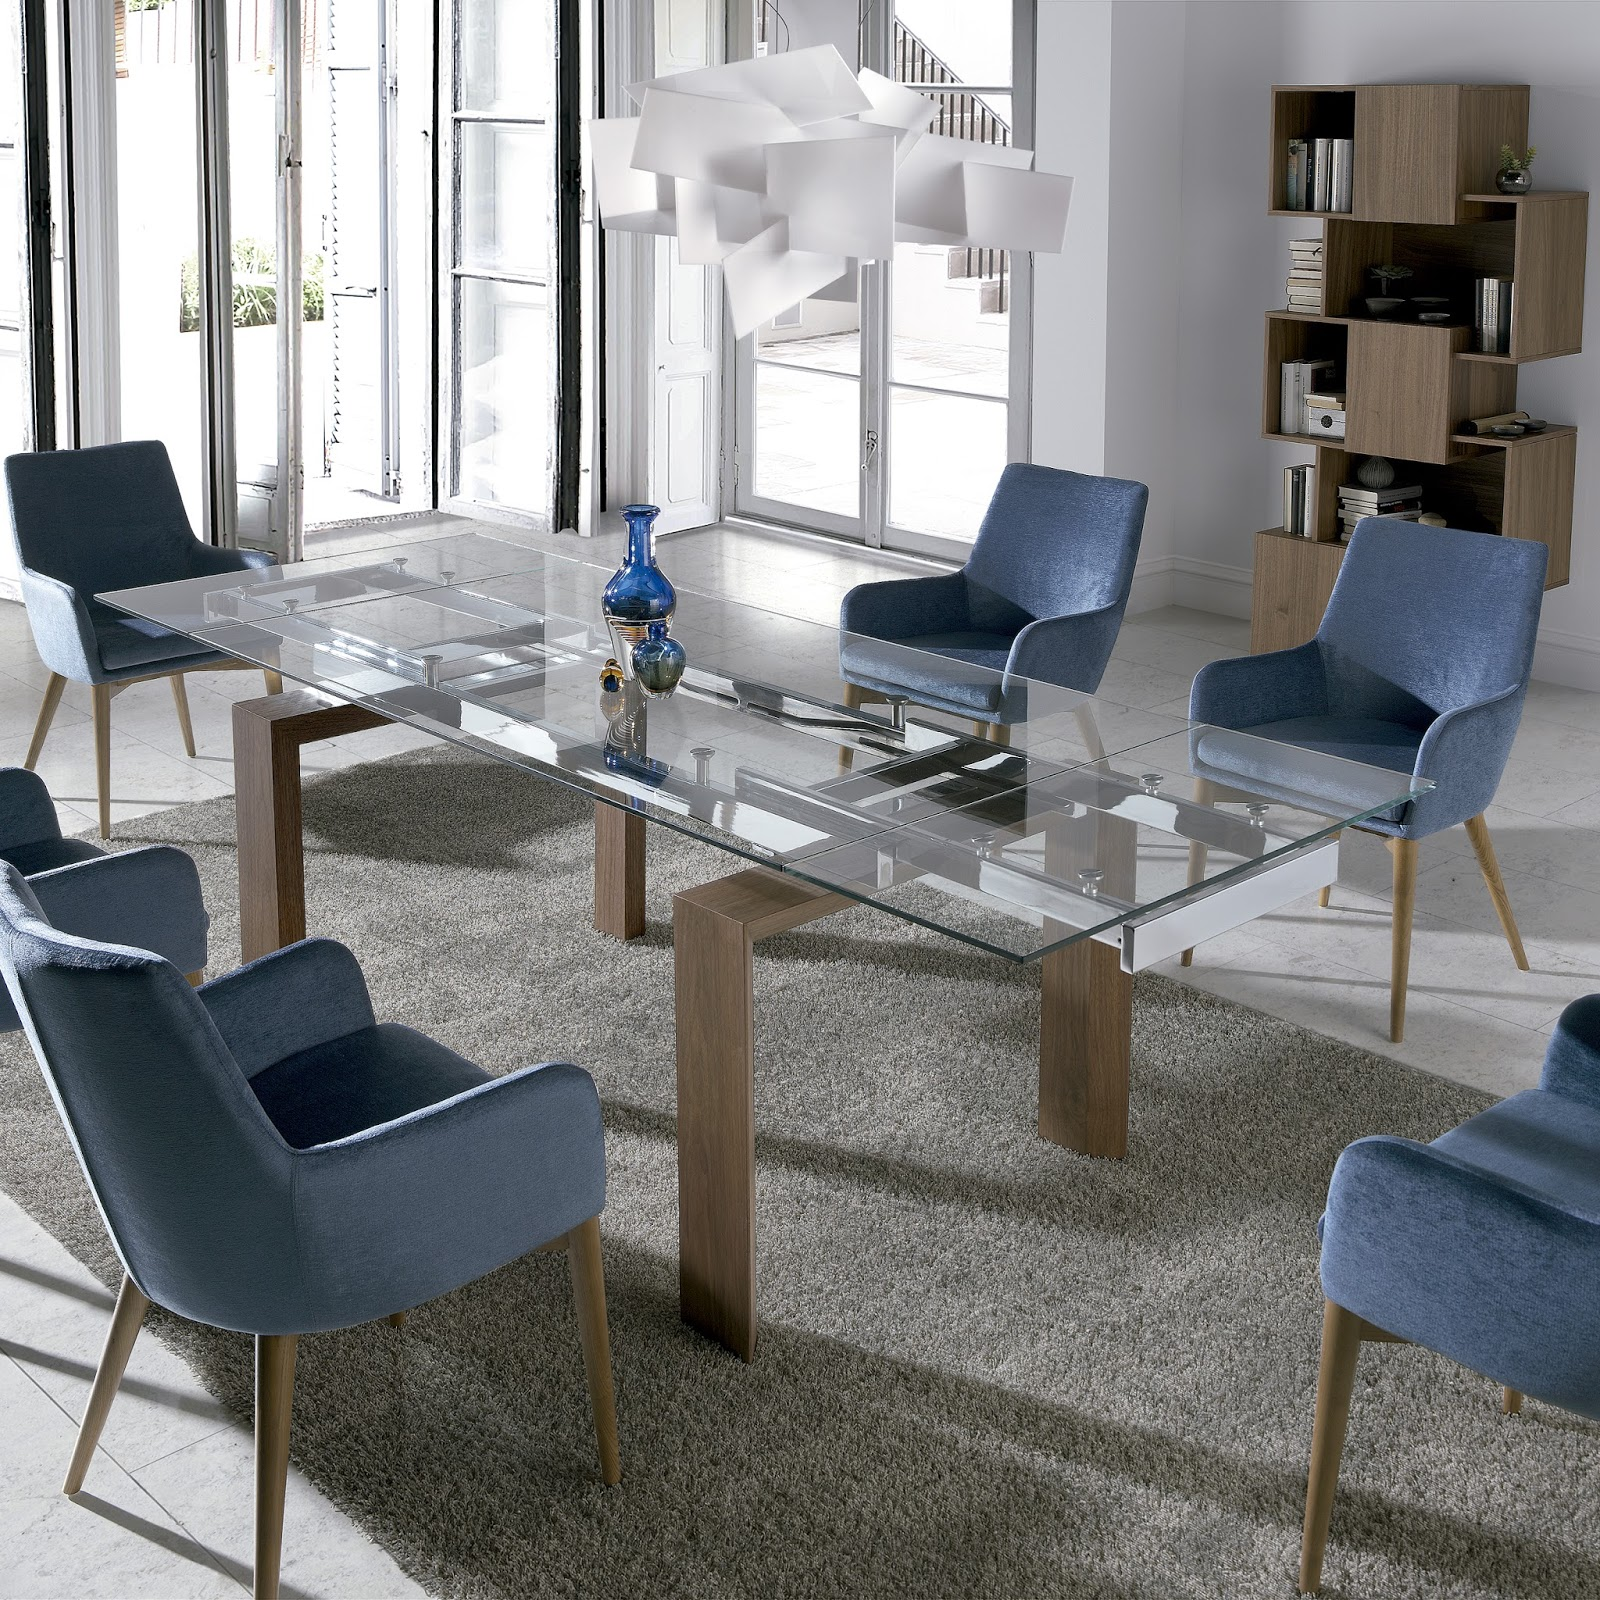 Mesas de comedor mesas de comedor extensibles de cristal for Mesas de comedor redondas de cristal